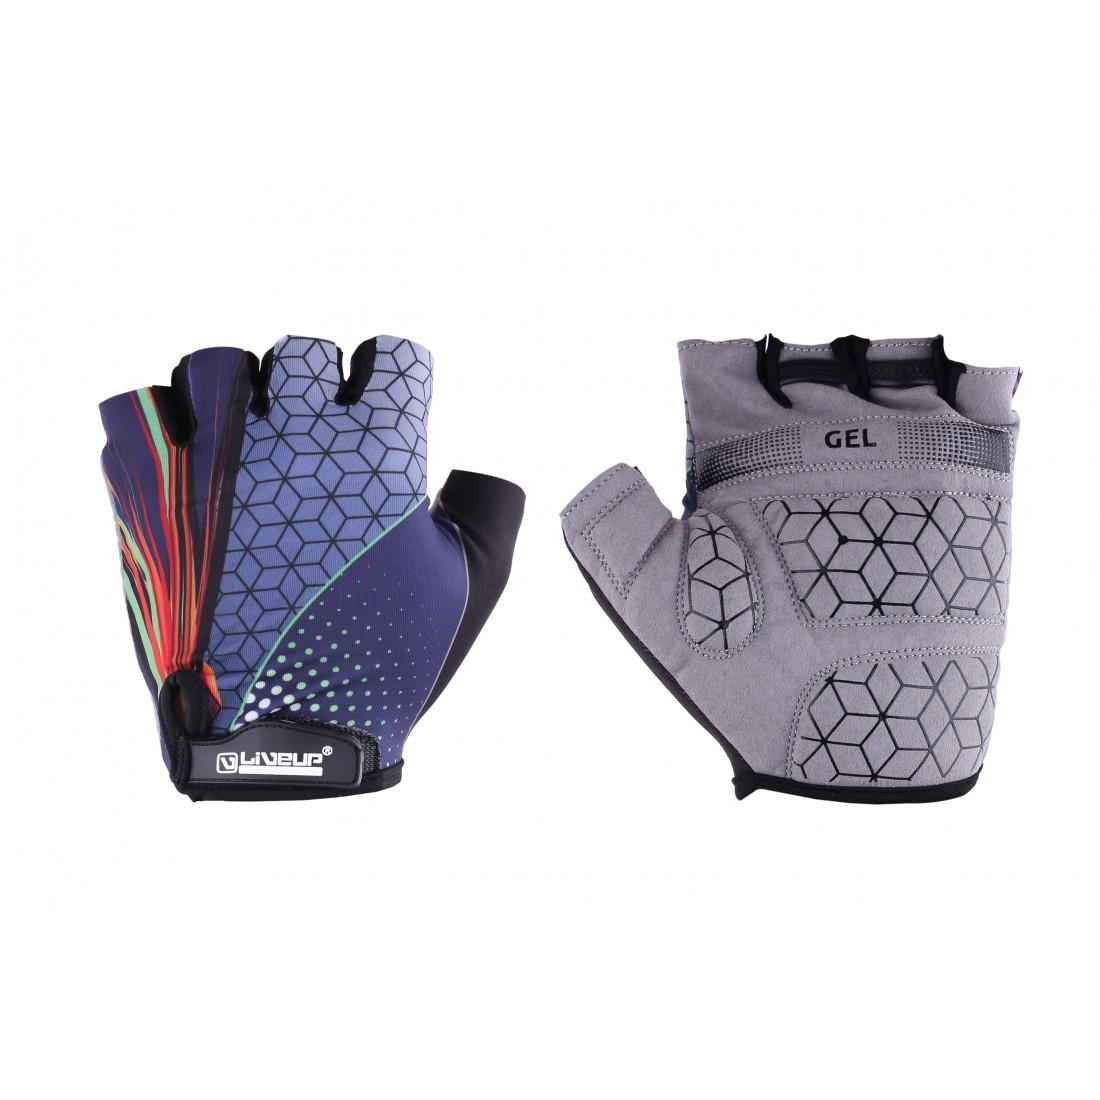 Спортивные перчатки Liveup WOMEN MULTI SPORT GLOVES (Размер - M)